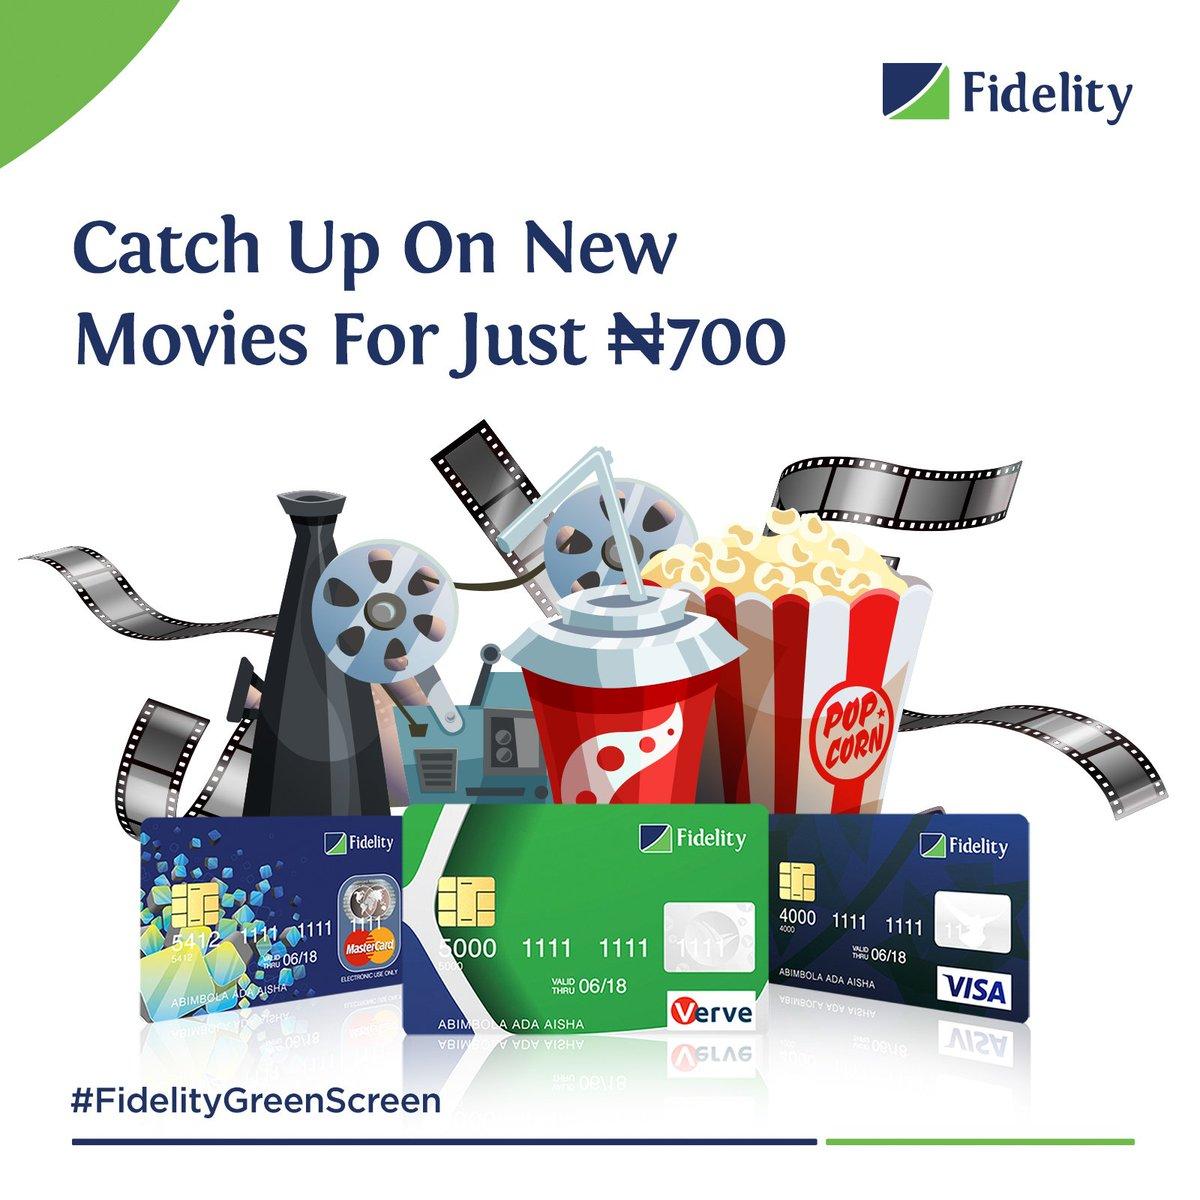 Fidelity Bank (@fidelitybankplc) | Twitter